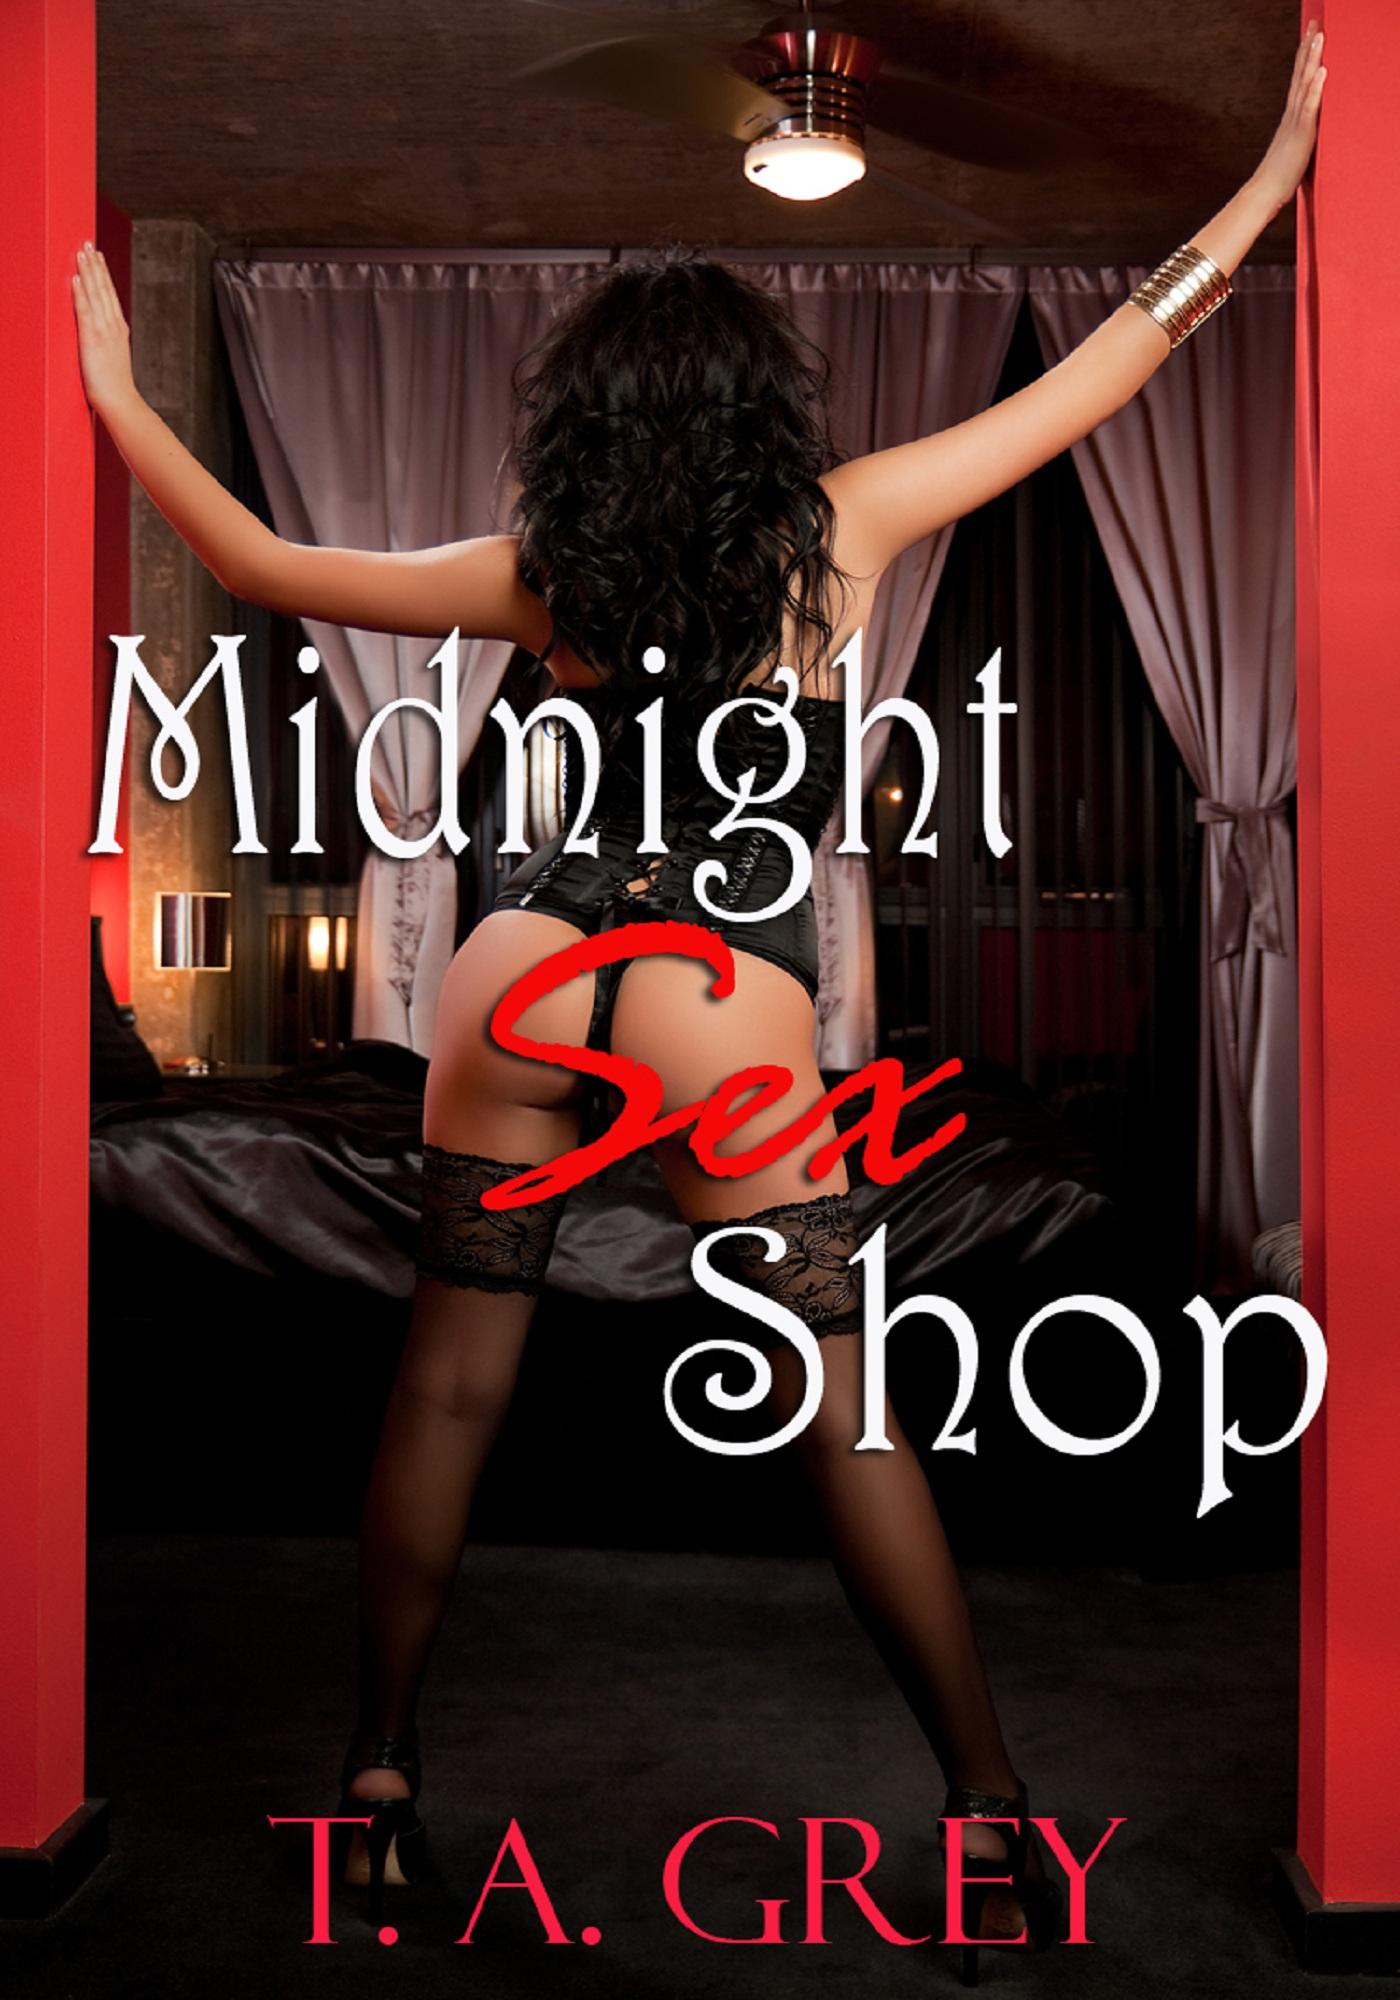 T. A. Grey - Midnight Sex Shop